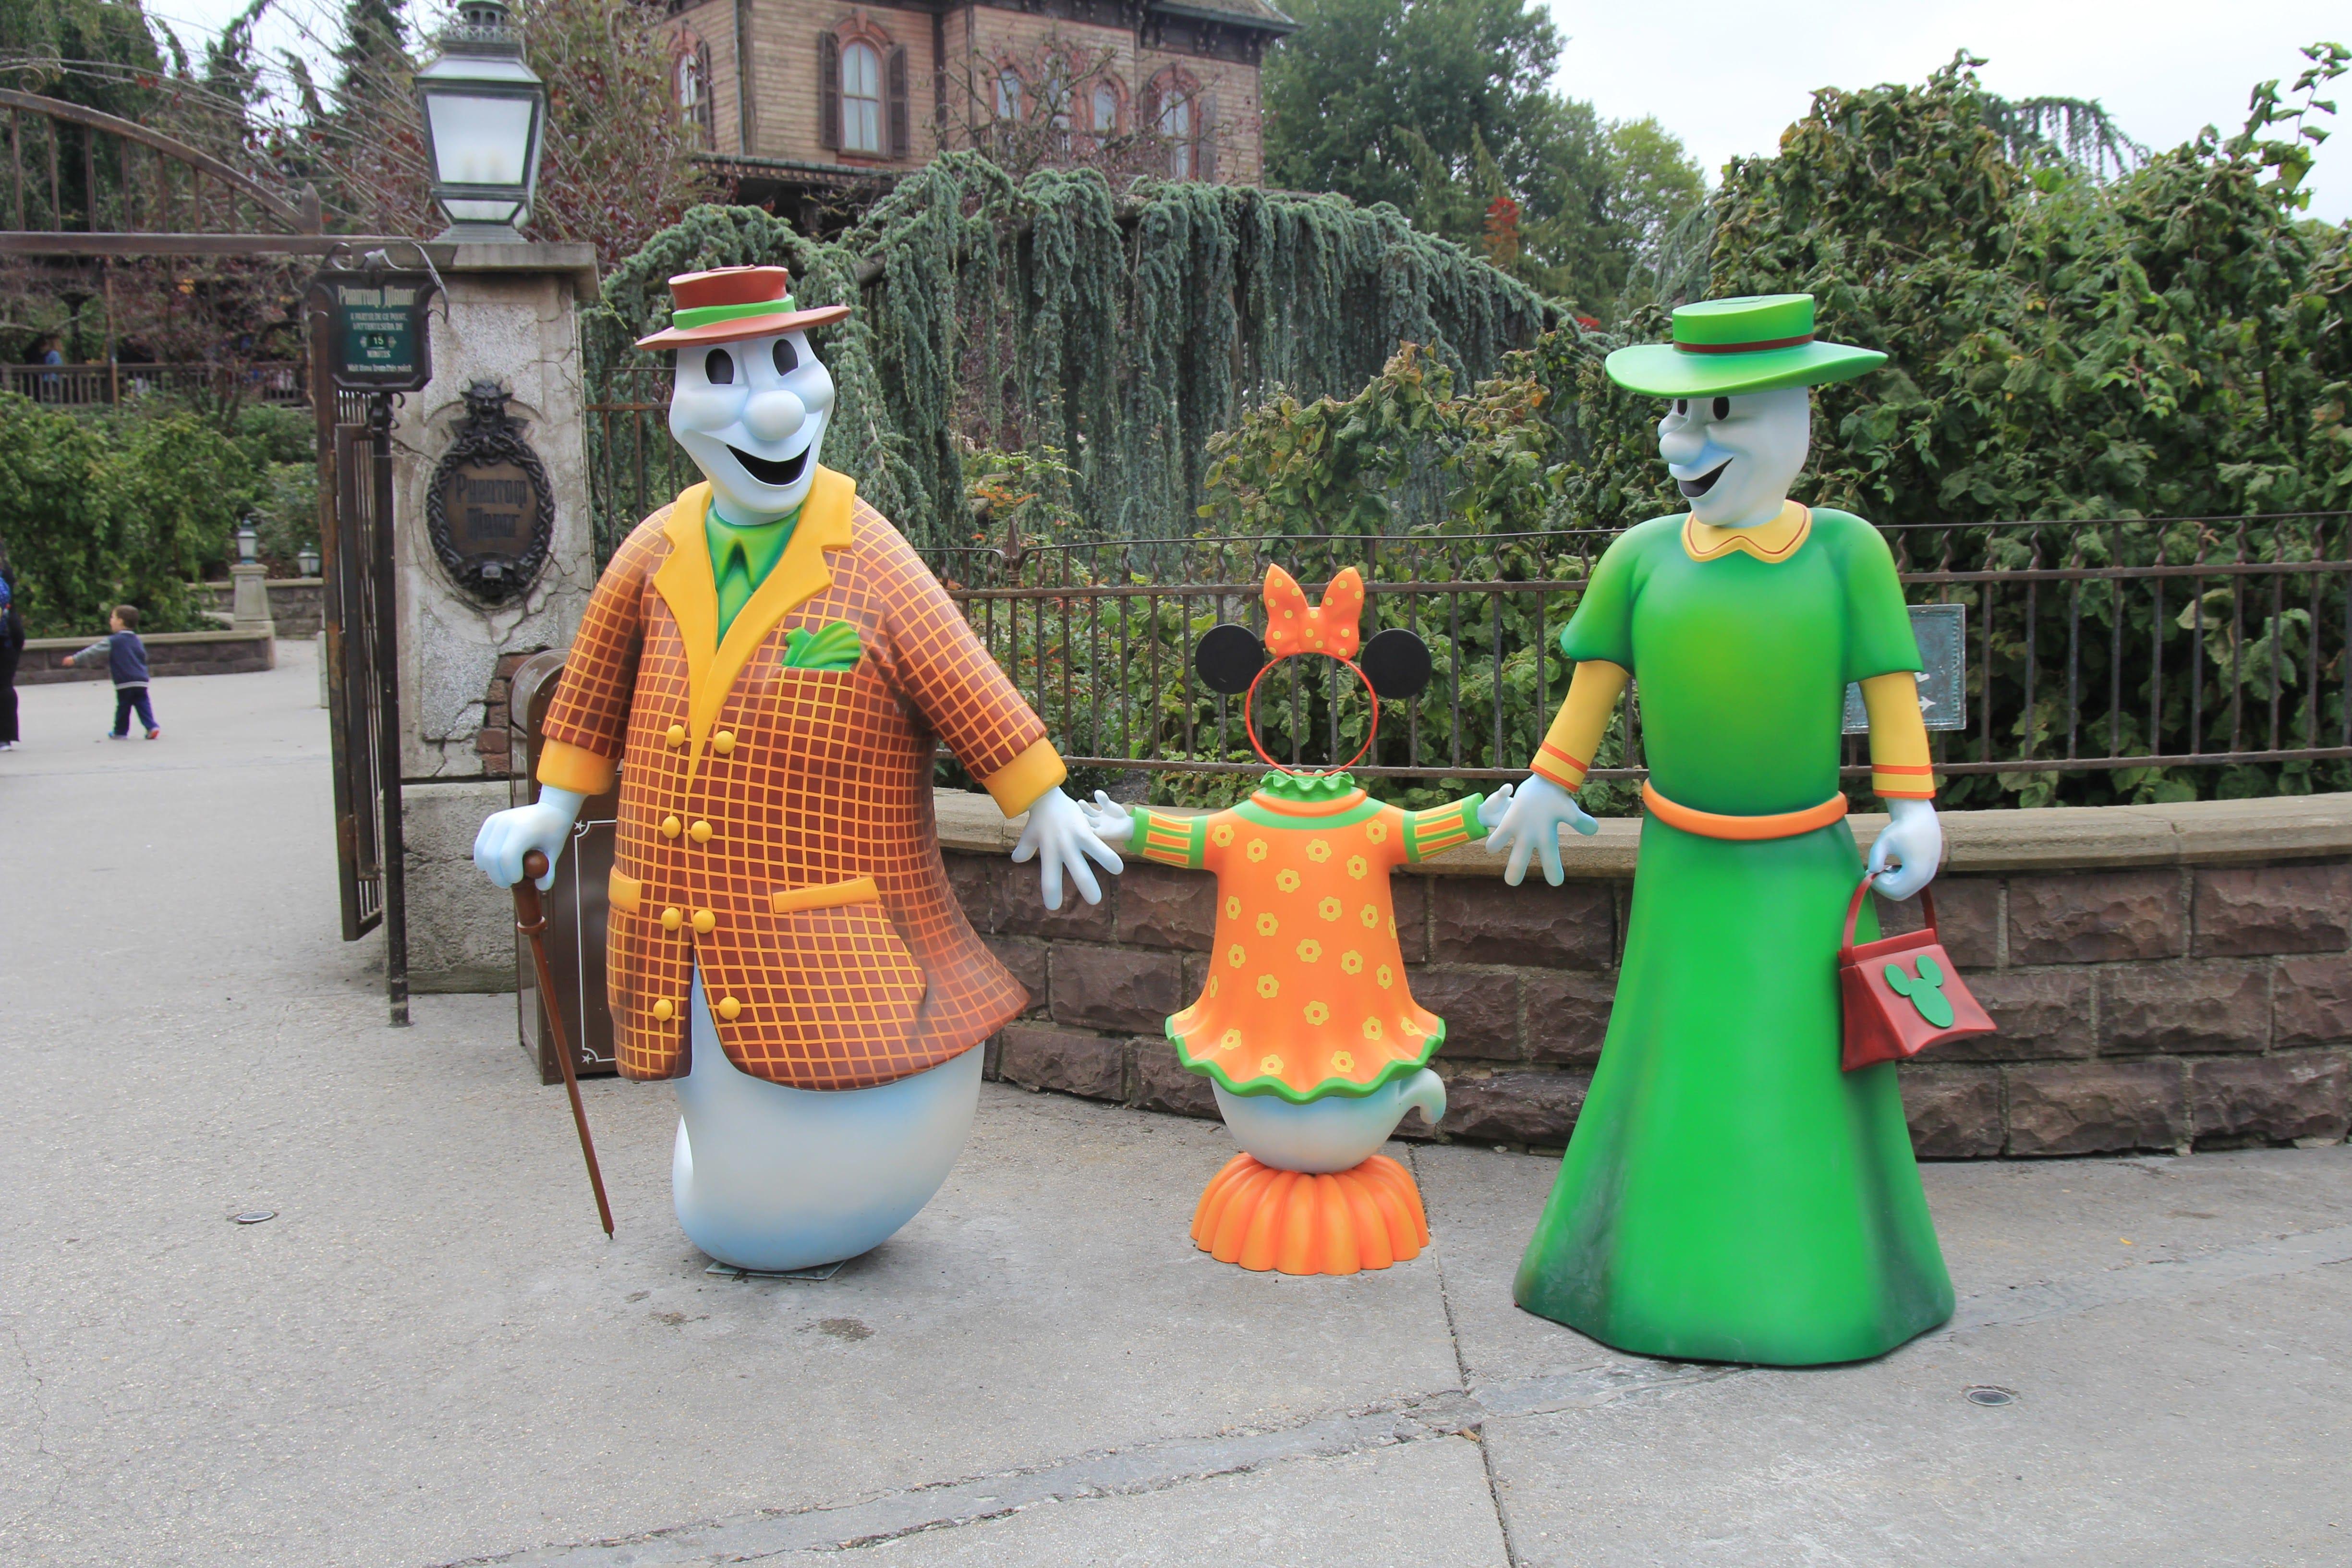 first look: halloween decorations disneyland paris 2017 - travel to